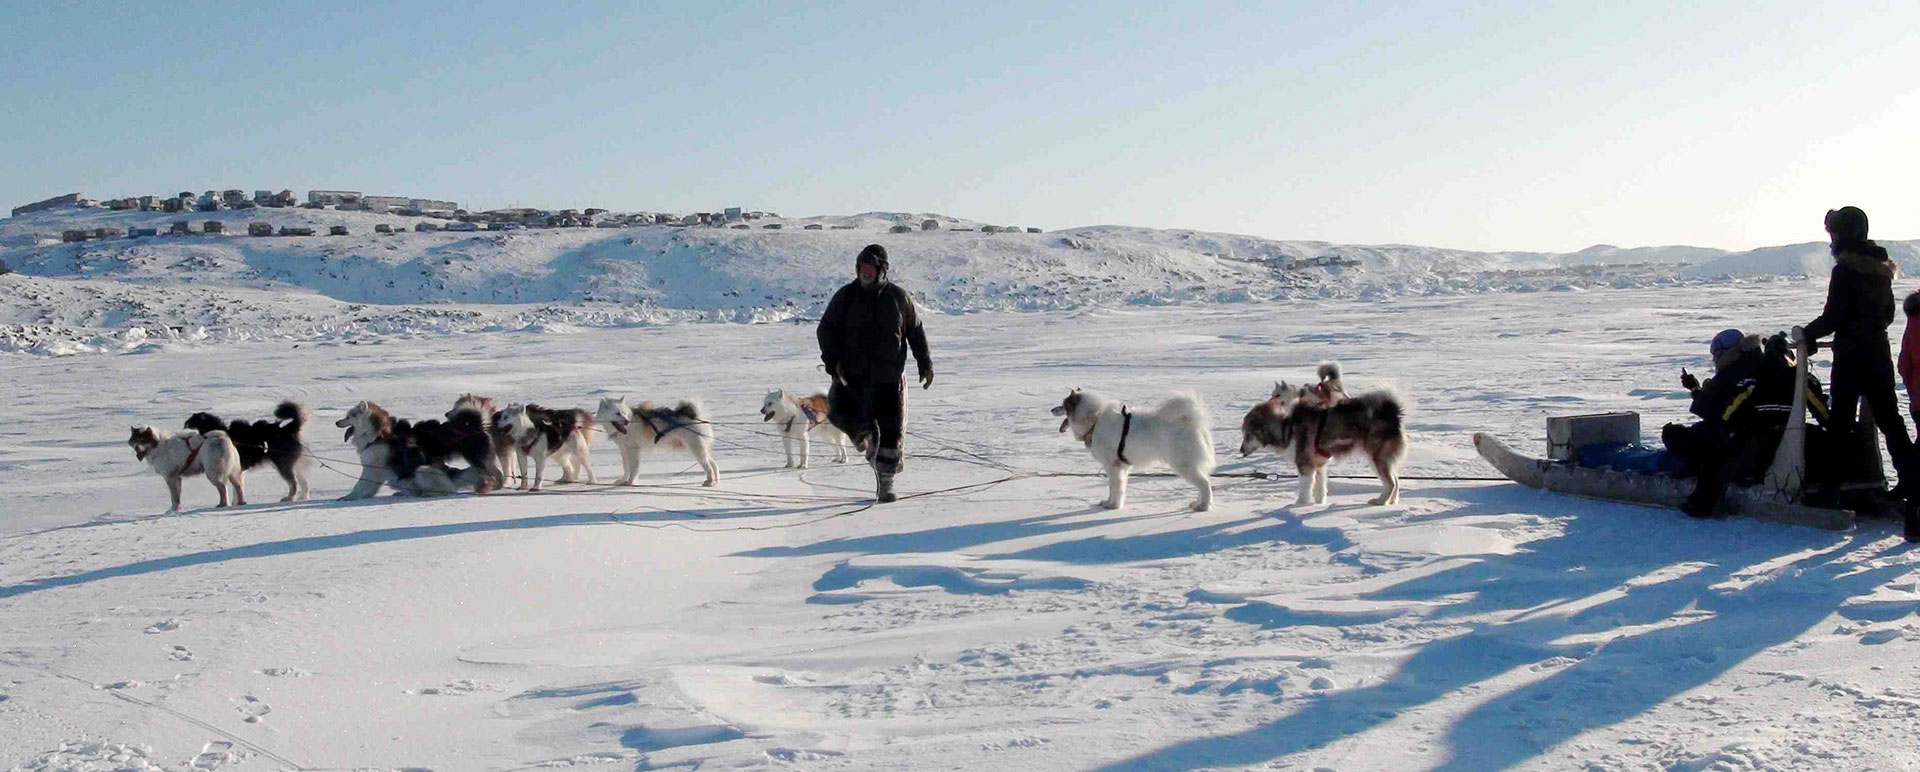 Nunavut-191